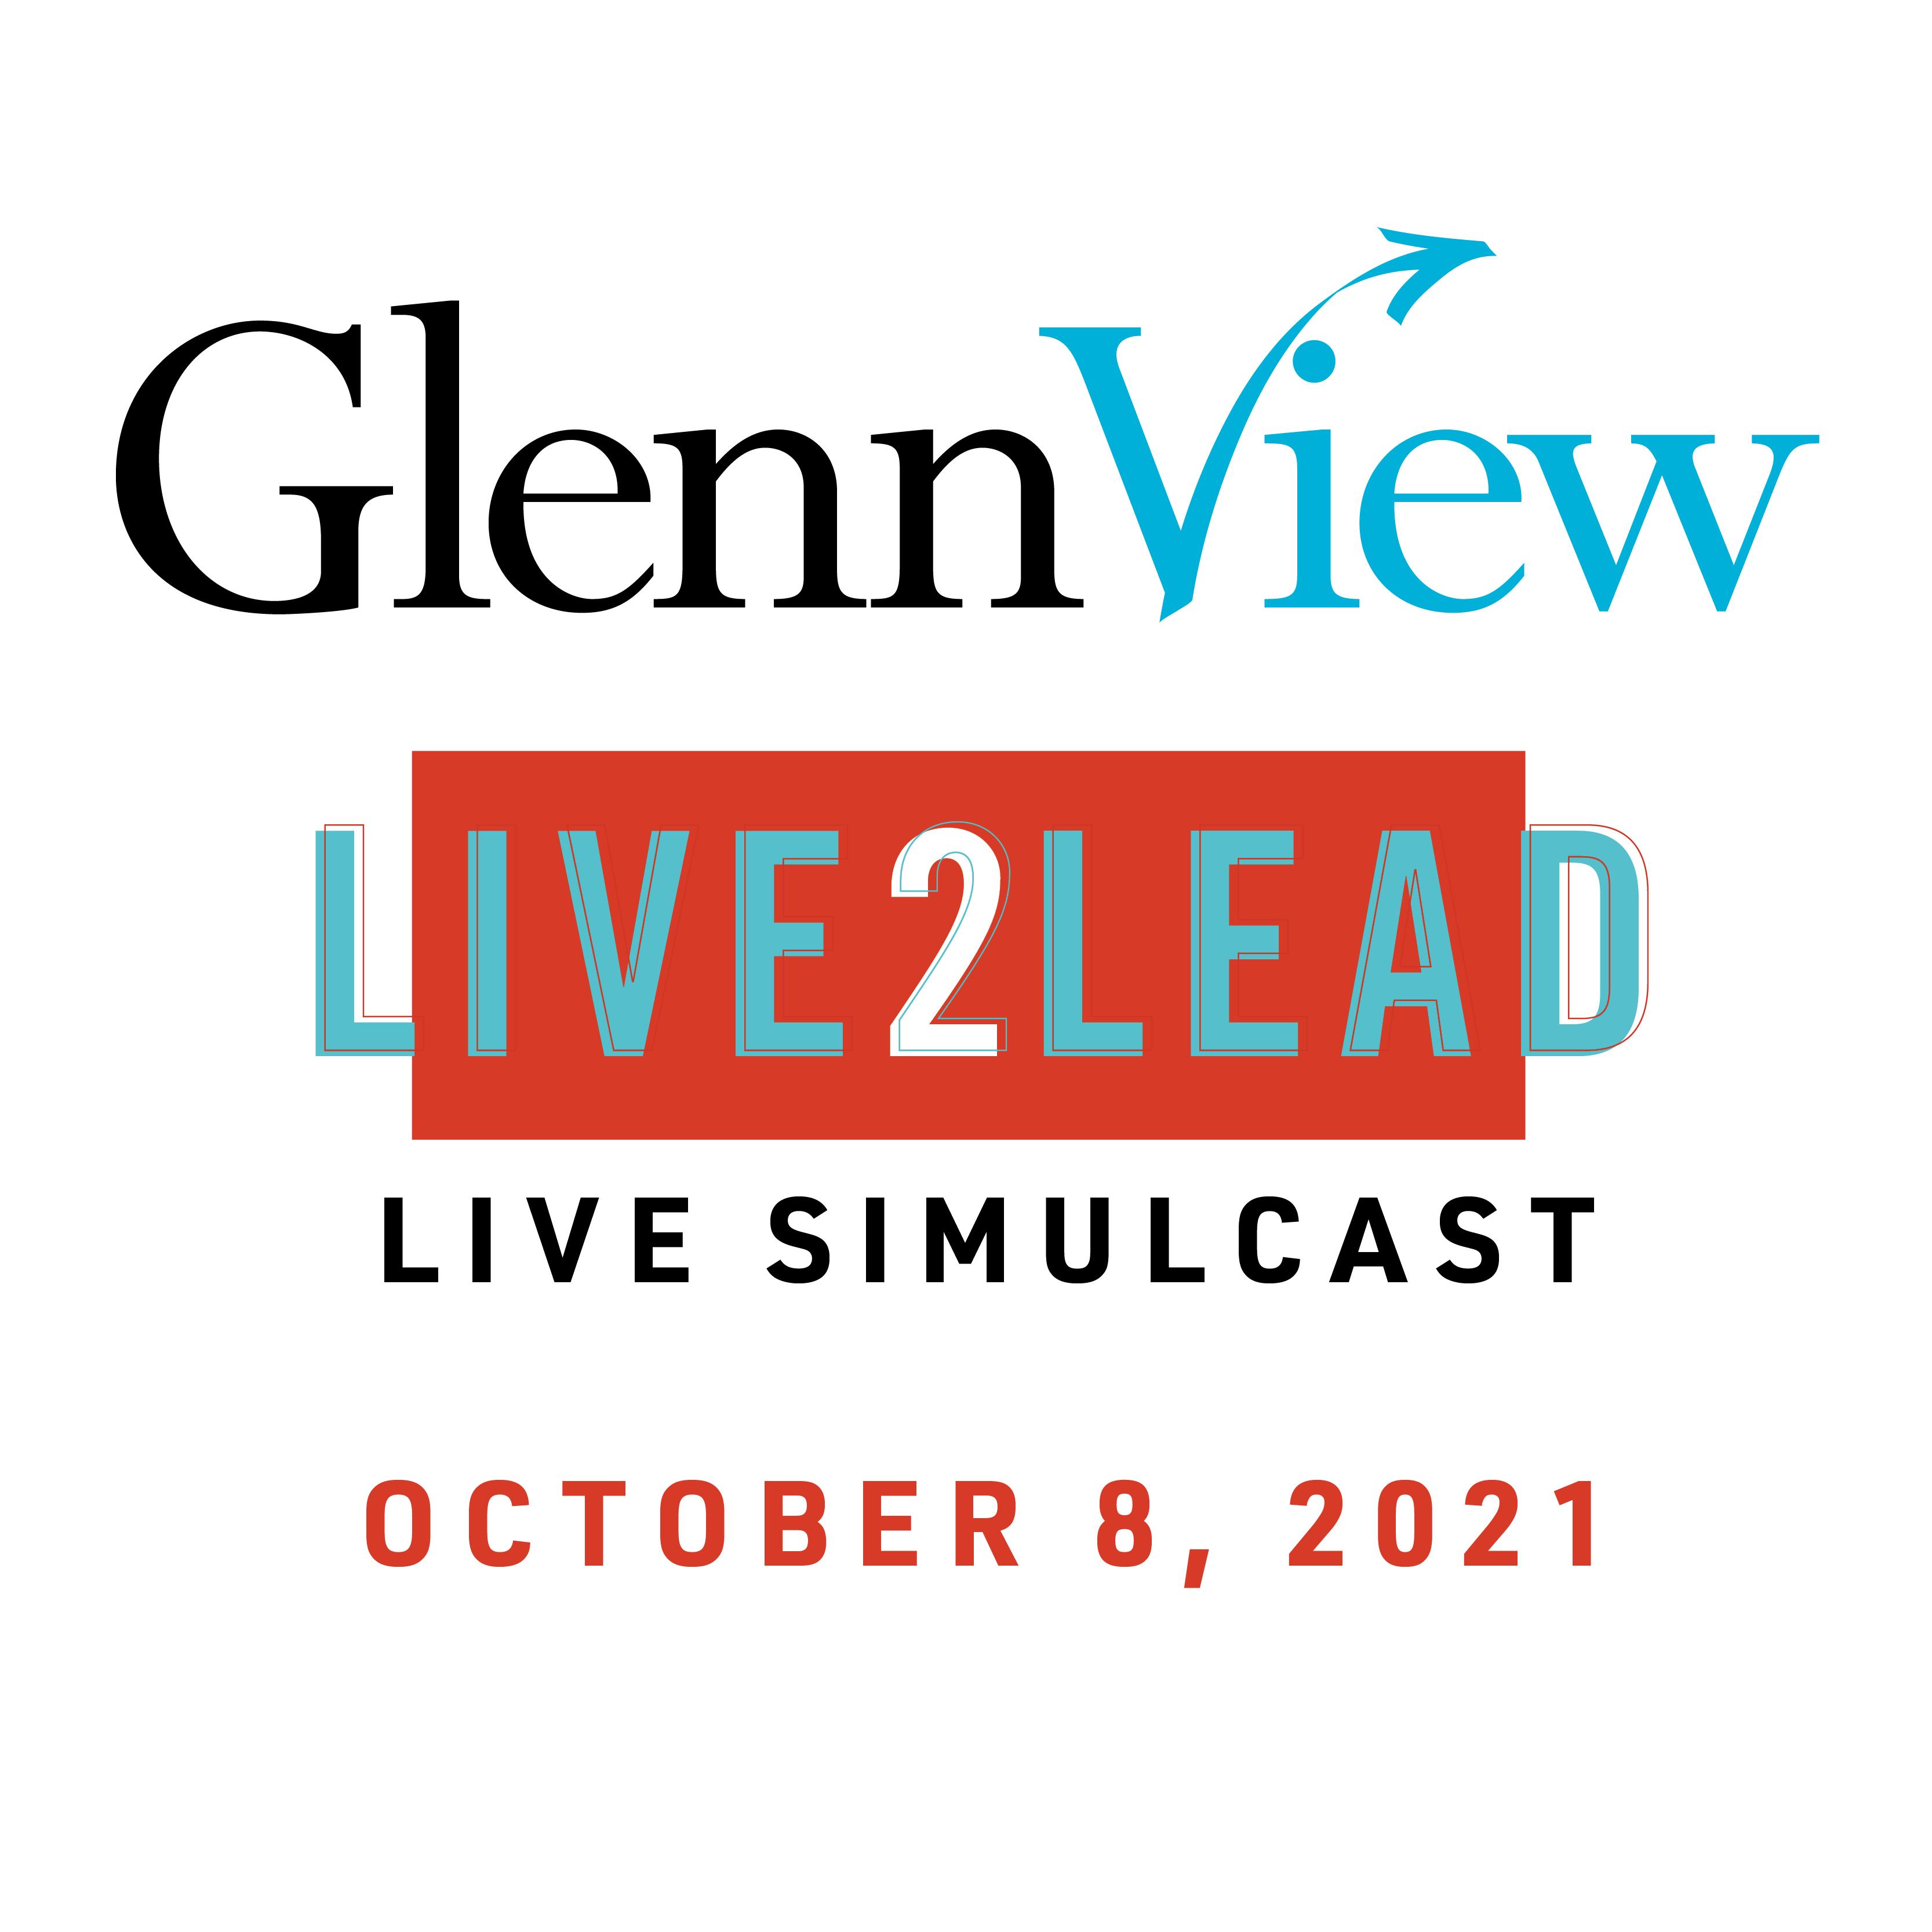 GlennView Live2Lead Live Simulcast logo